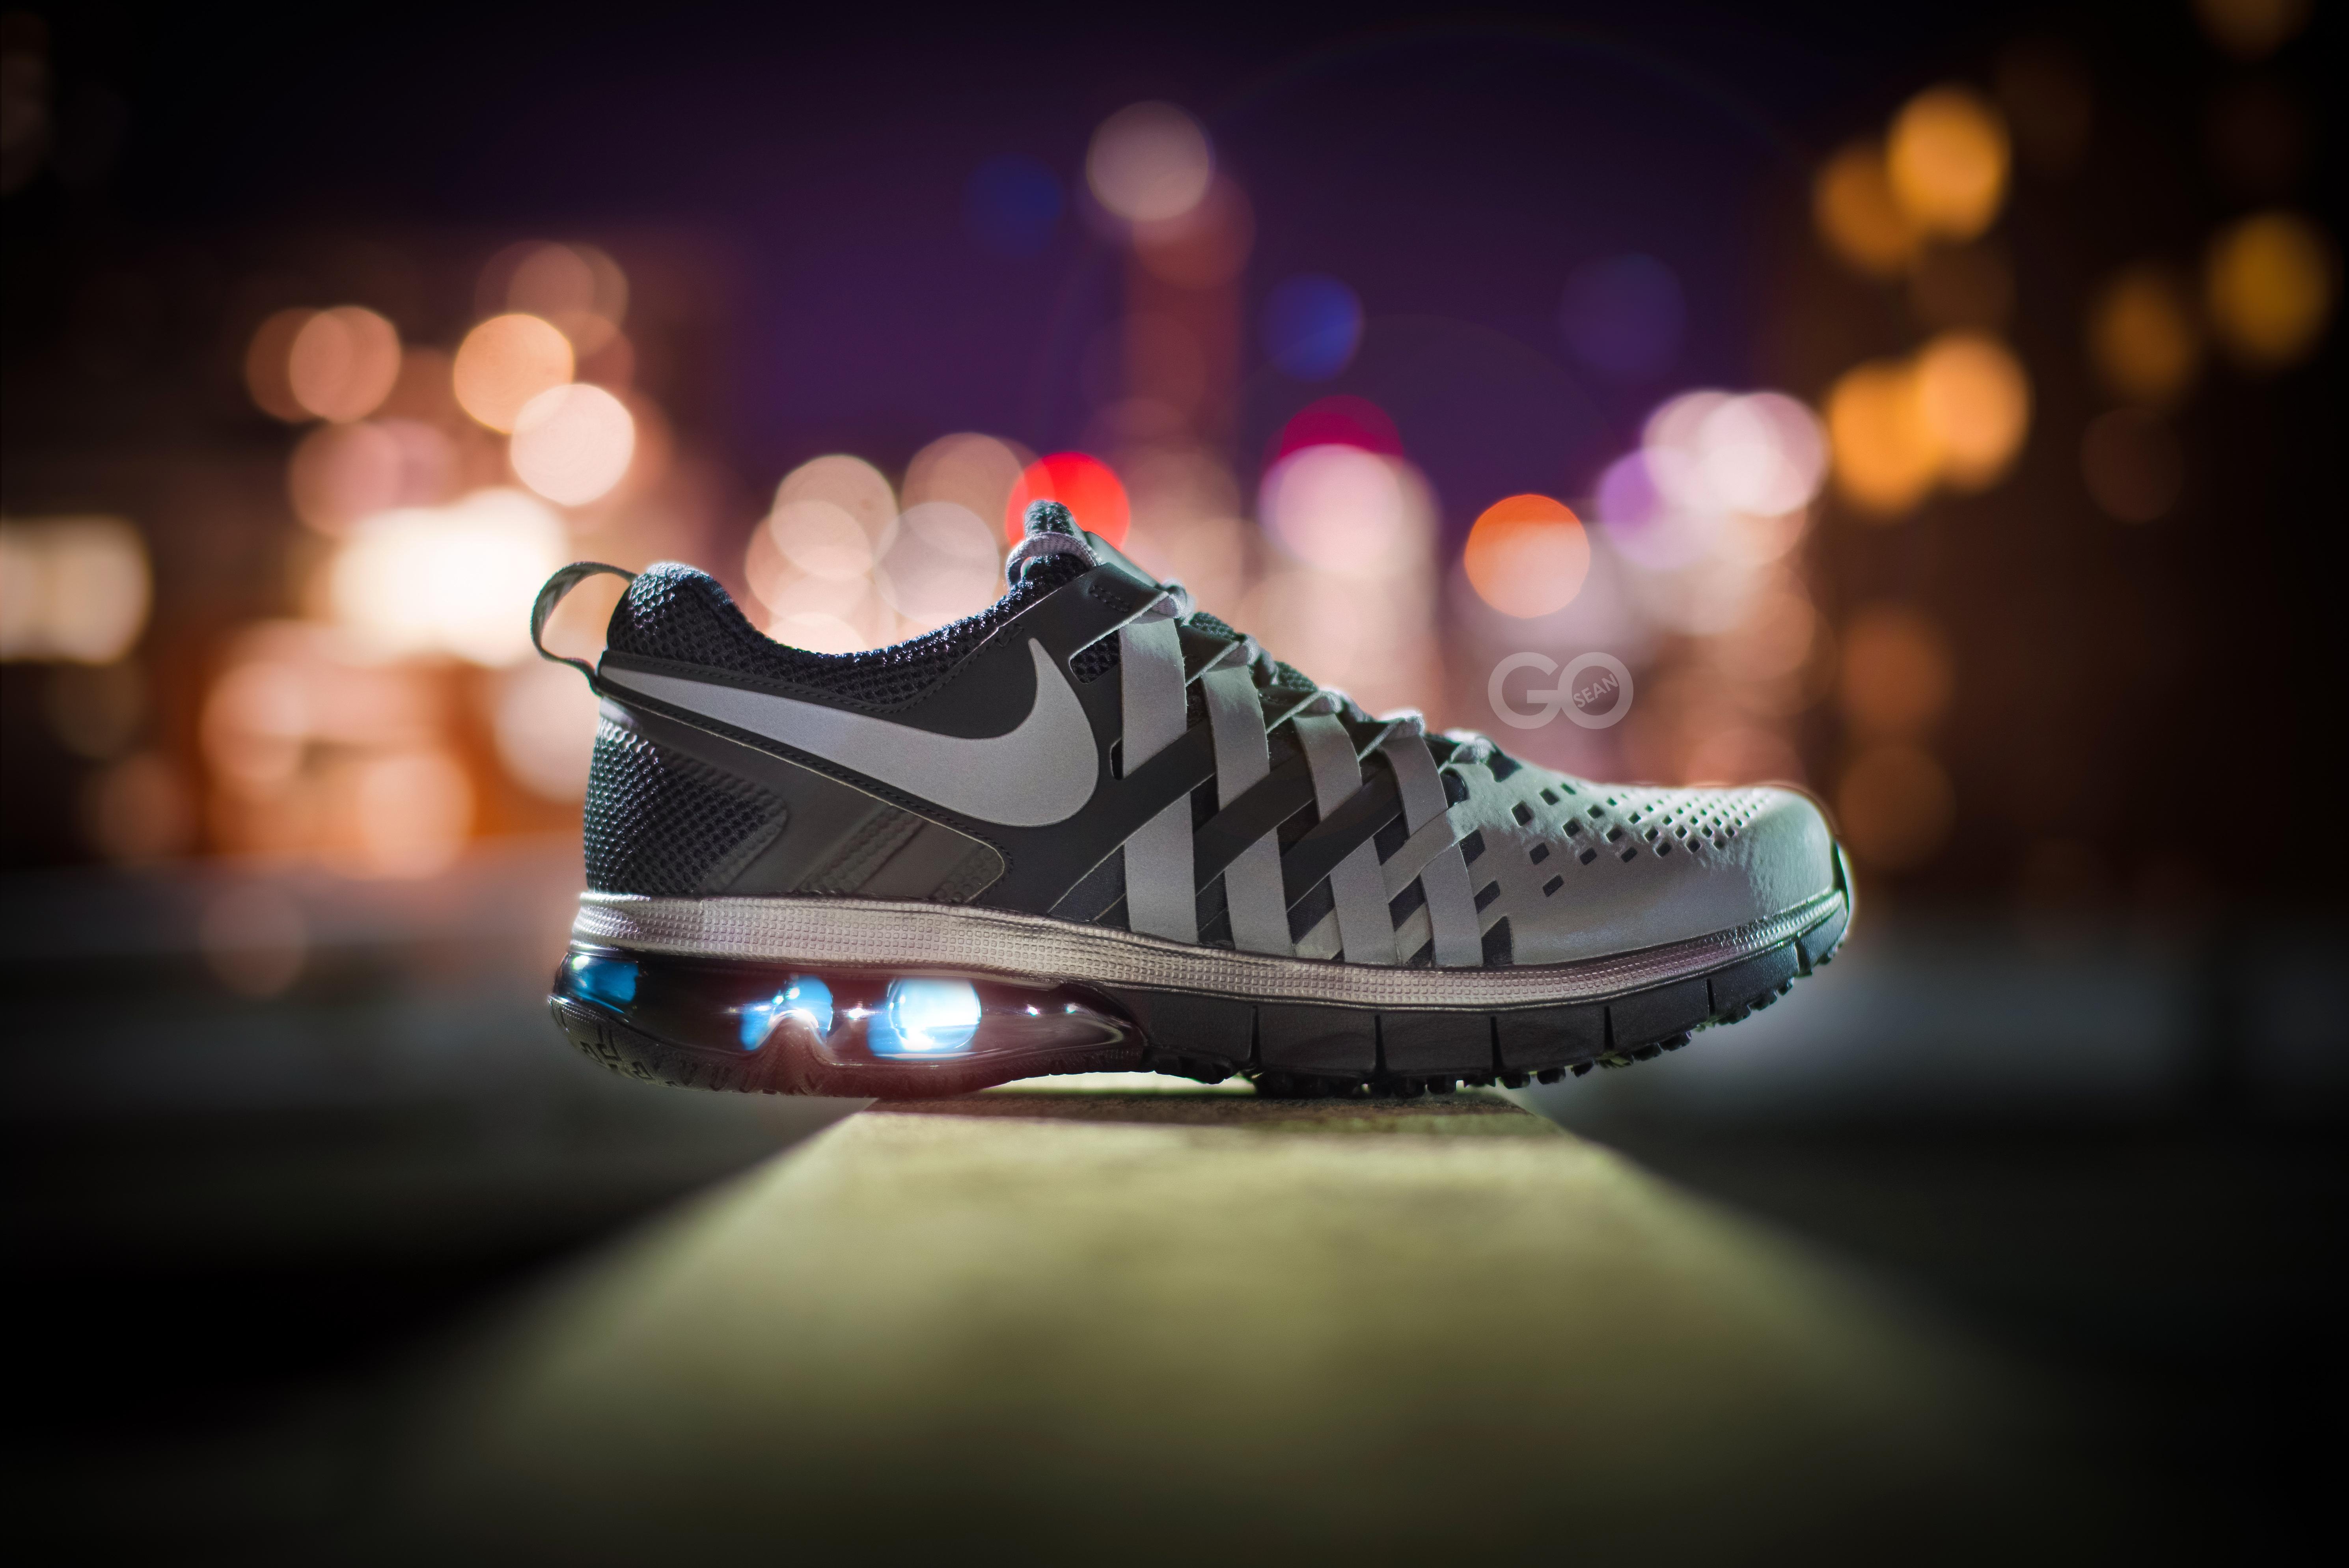 Wallpaper Nike lights black city night space photography